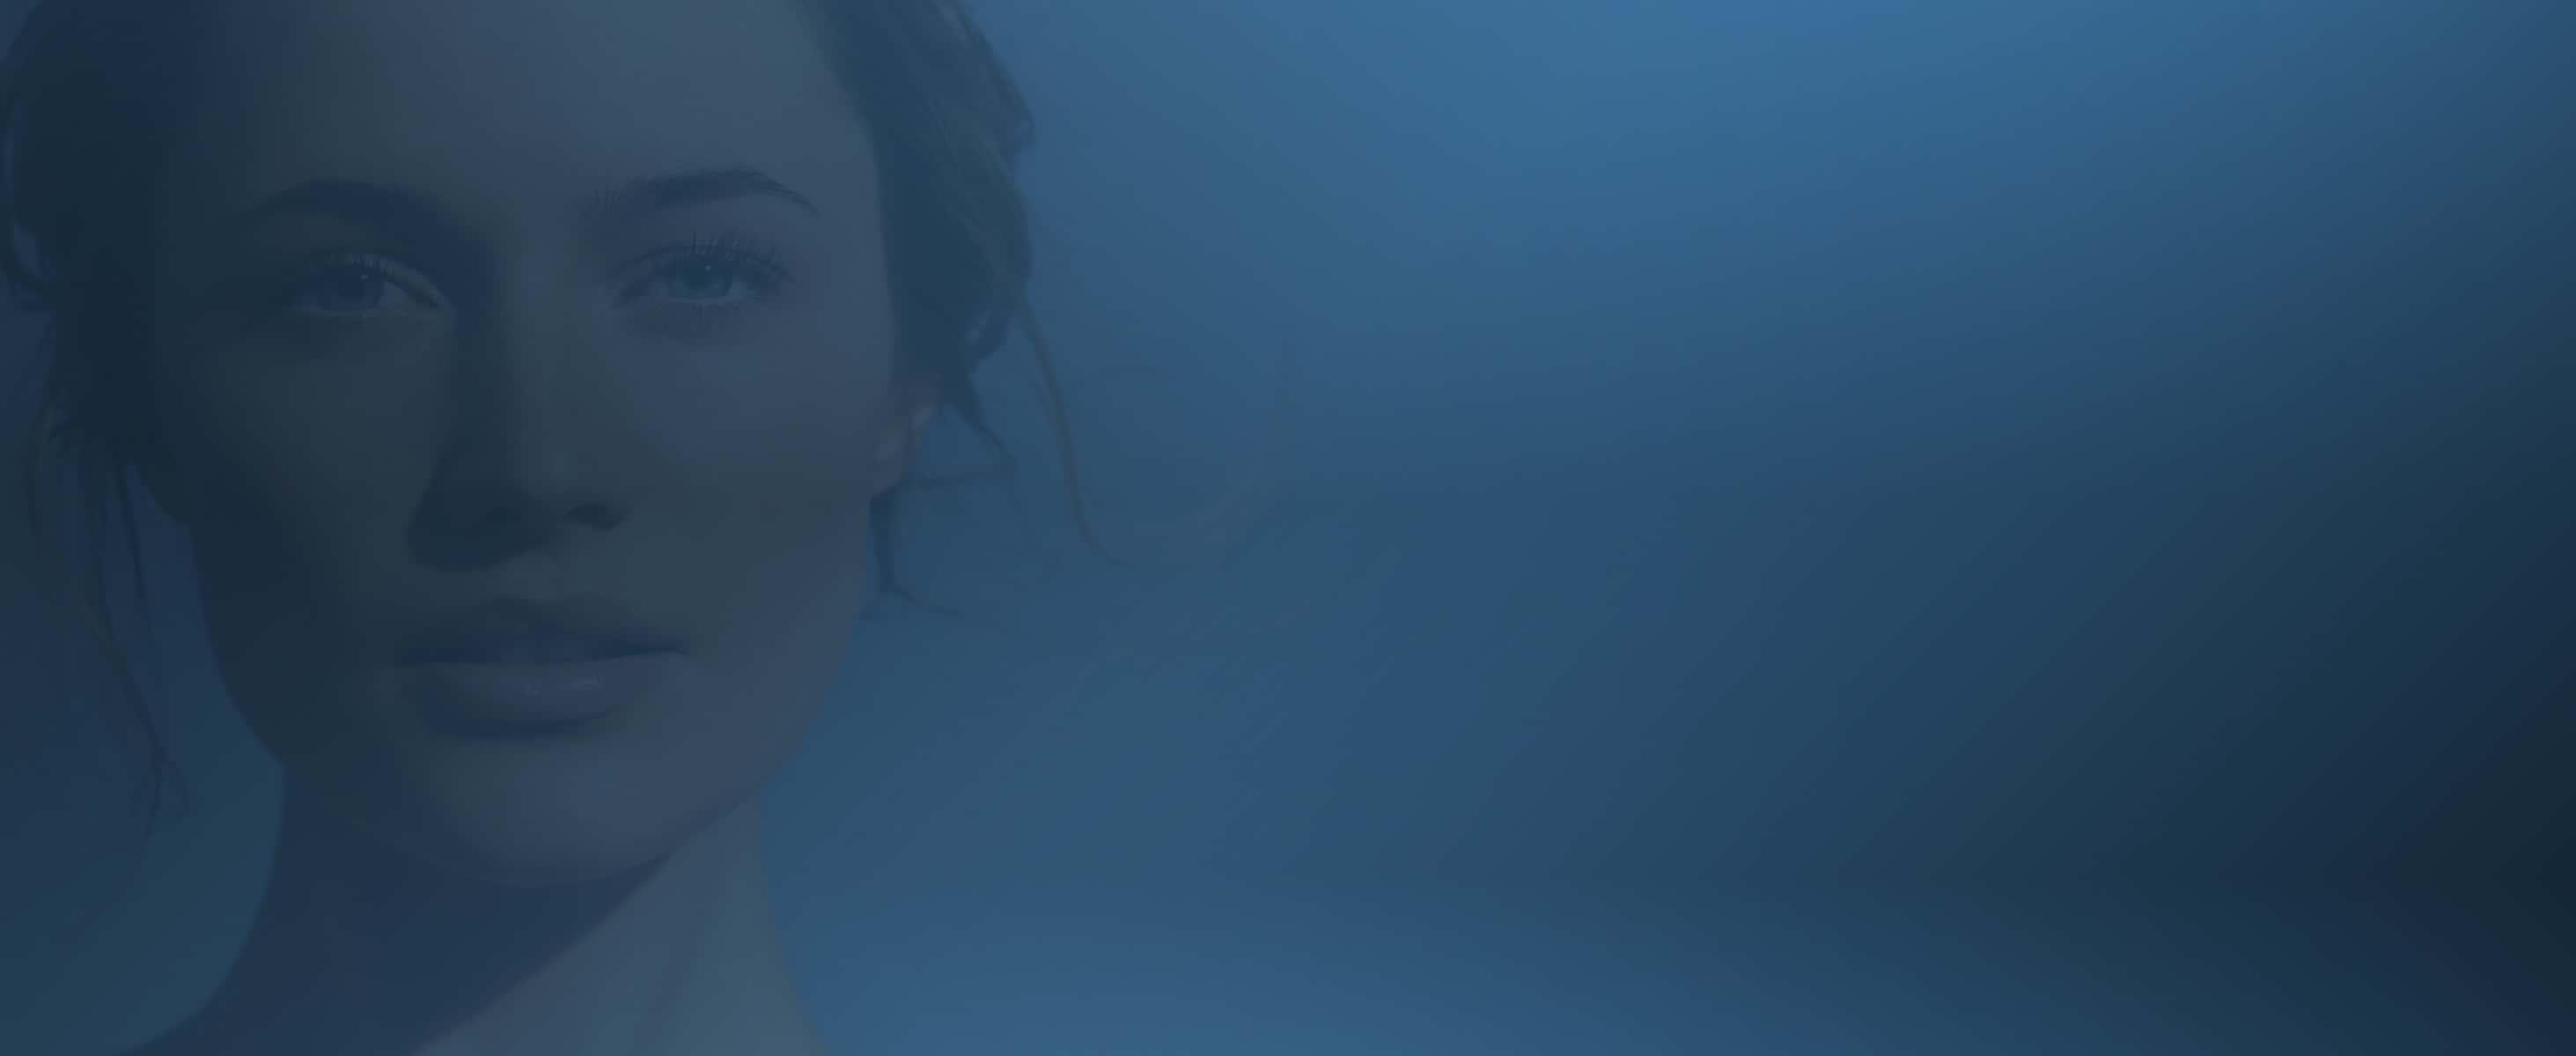 omnilux blue fondo, laser, rejuvenecimiento, facial, antiacné, manchas, belium, medical, luz, belleza, piel